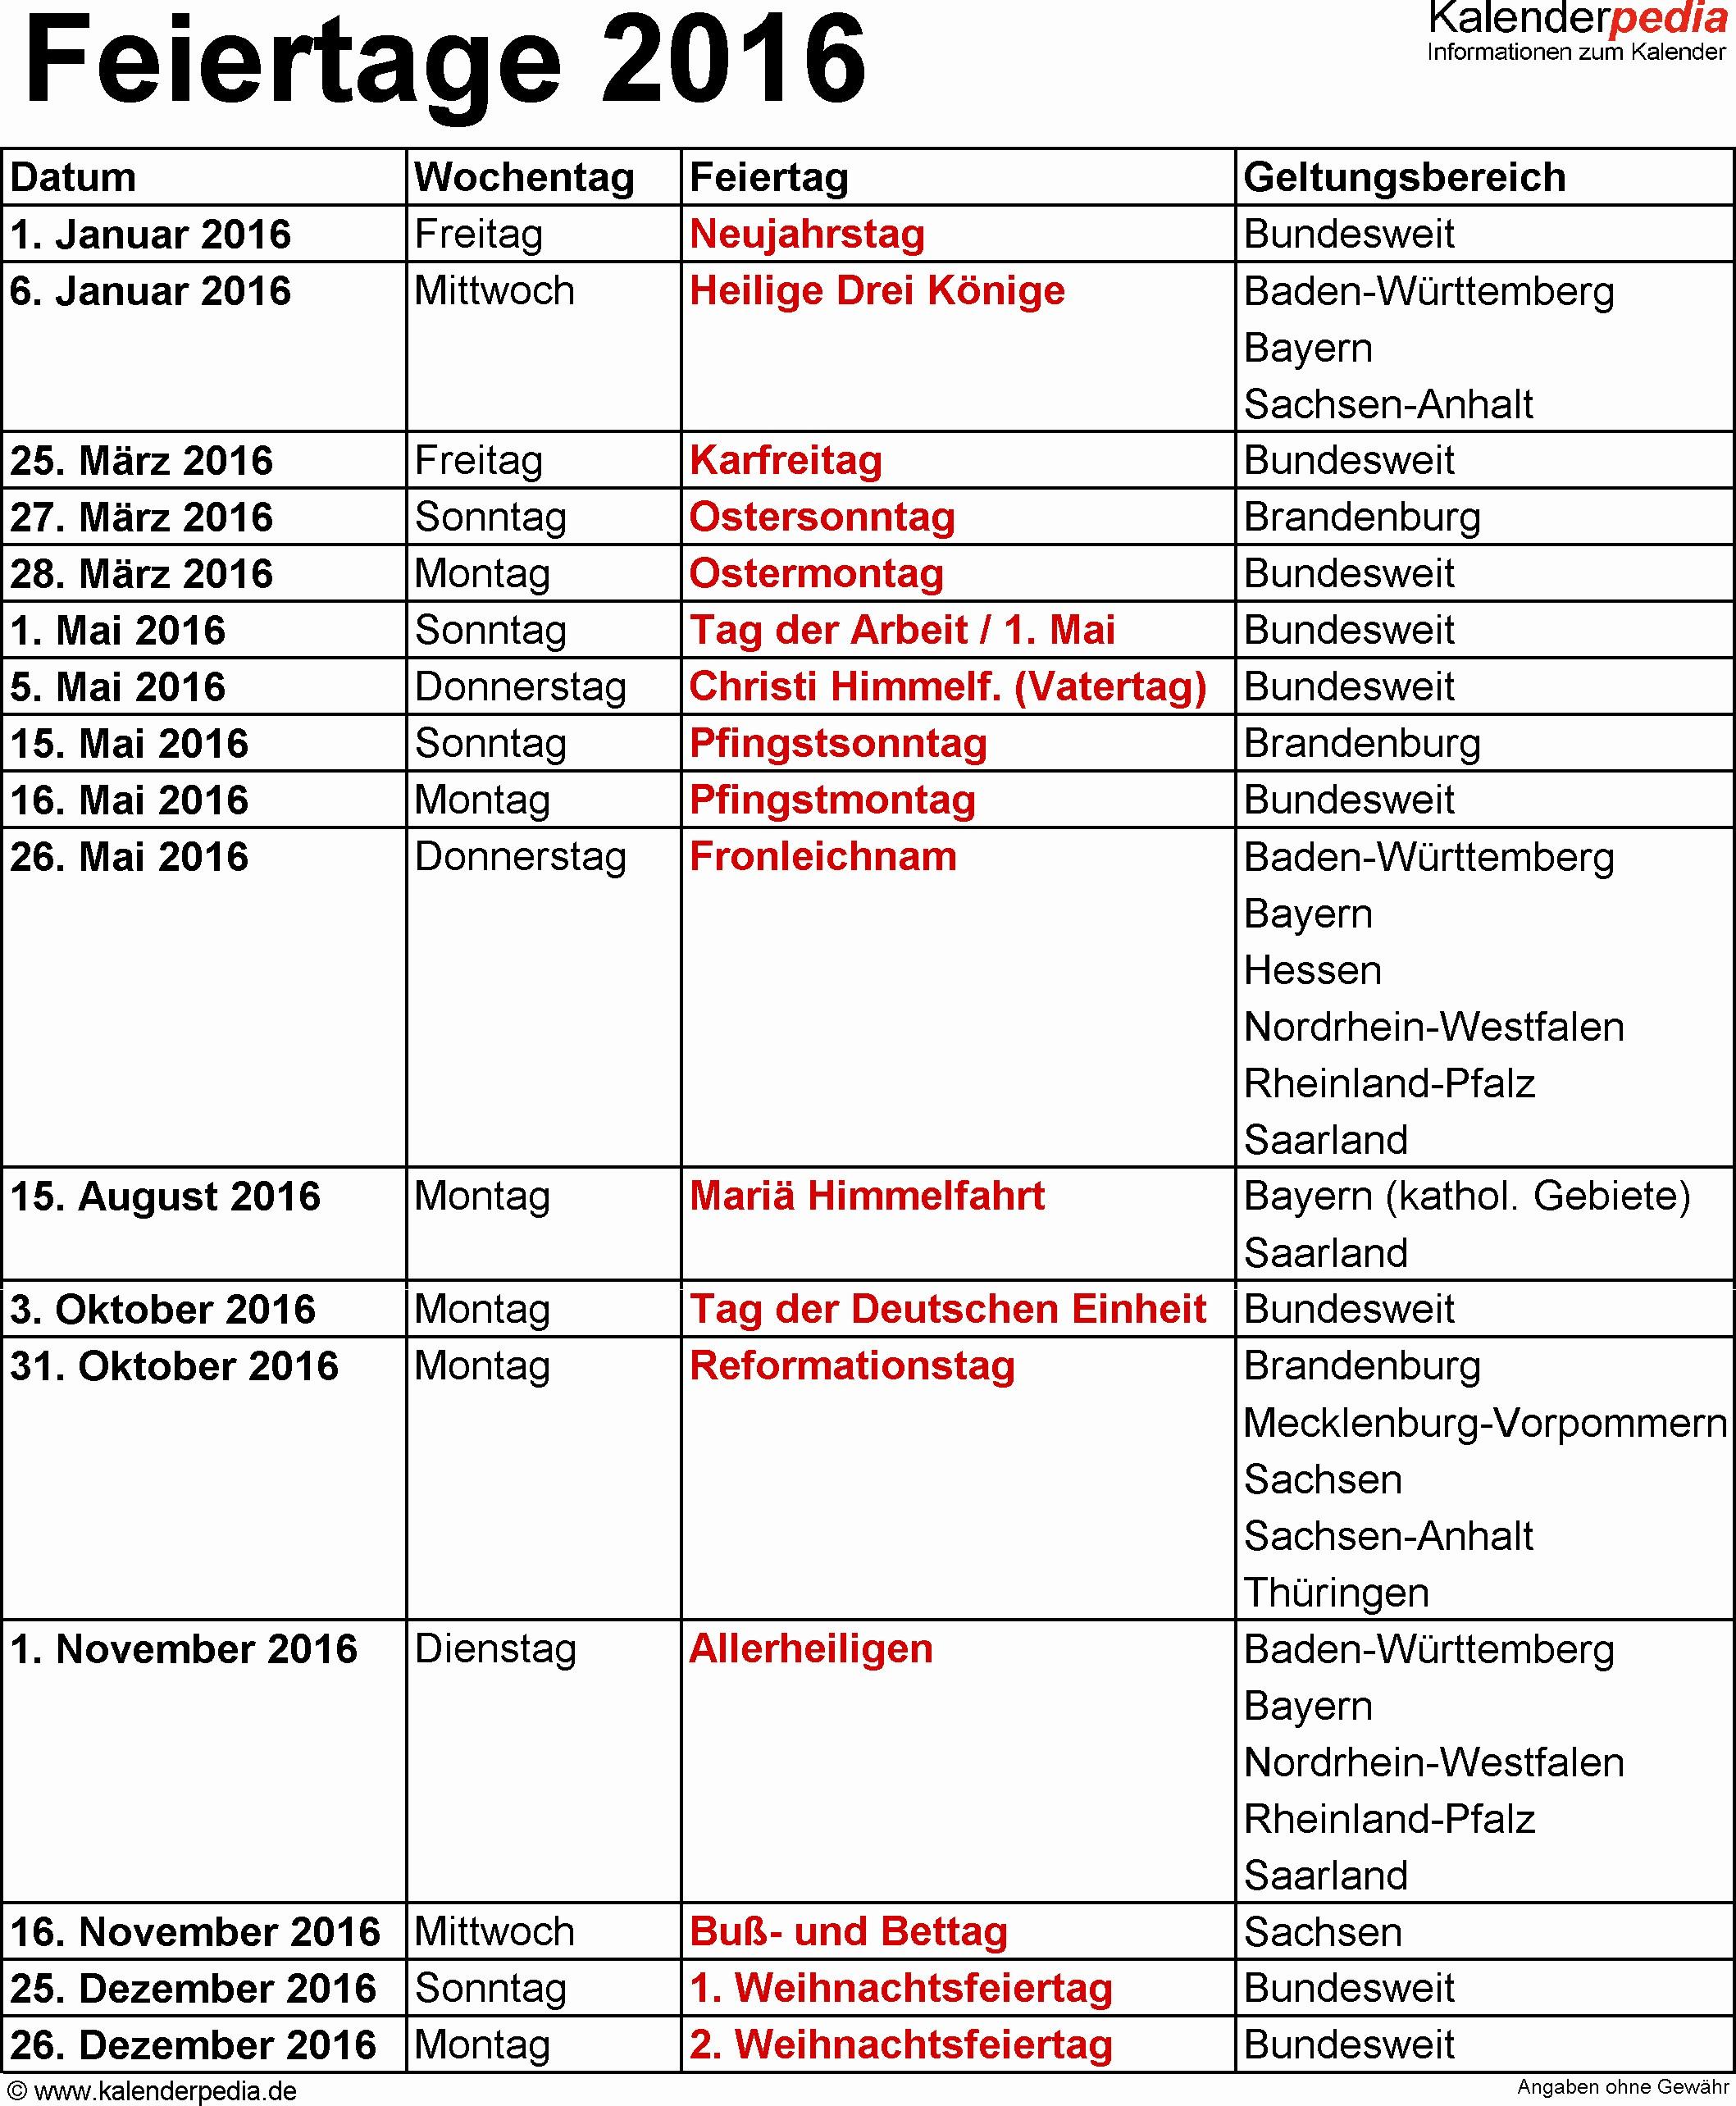 Kalender 2019 Excel Sachsen Más Arriba-a-fecha Kalender 2016 Mit Feiertagen Sachsen Genial 51 Inspirierend Bilder Of Kalender 2019 Excel Sachsen Más Arriba-a-fecha Excel Kalender 2015 Kubra Kubkireklamowe